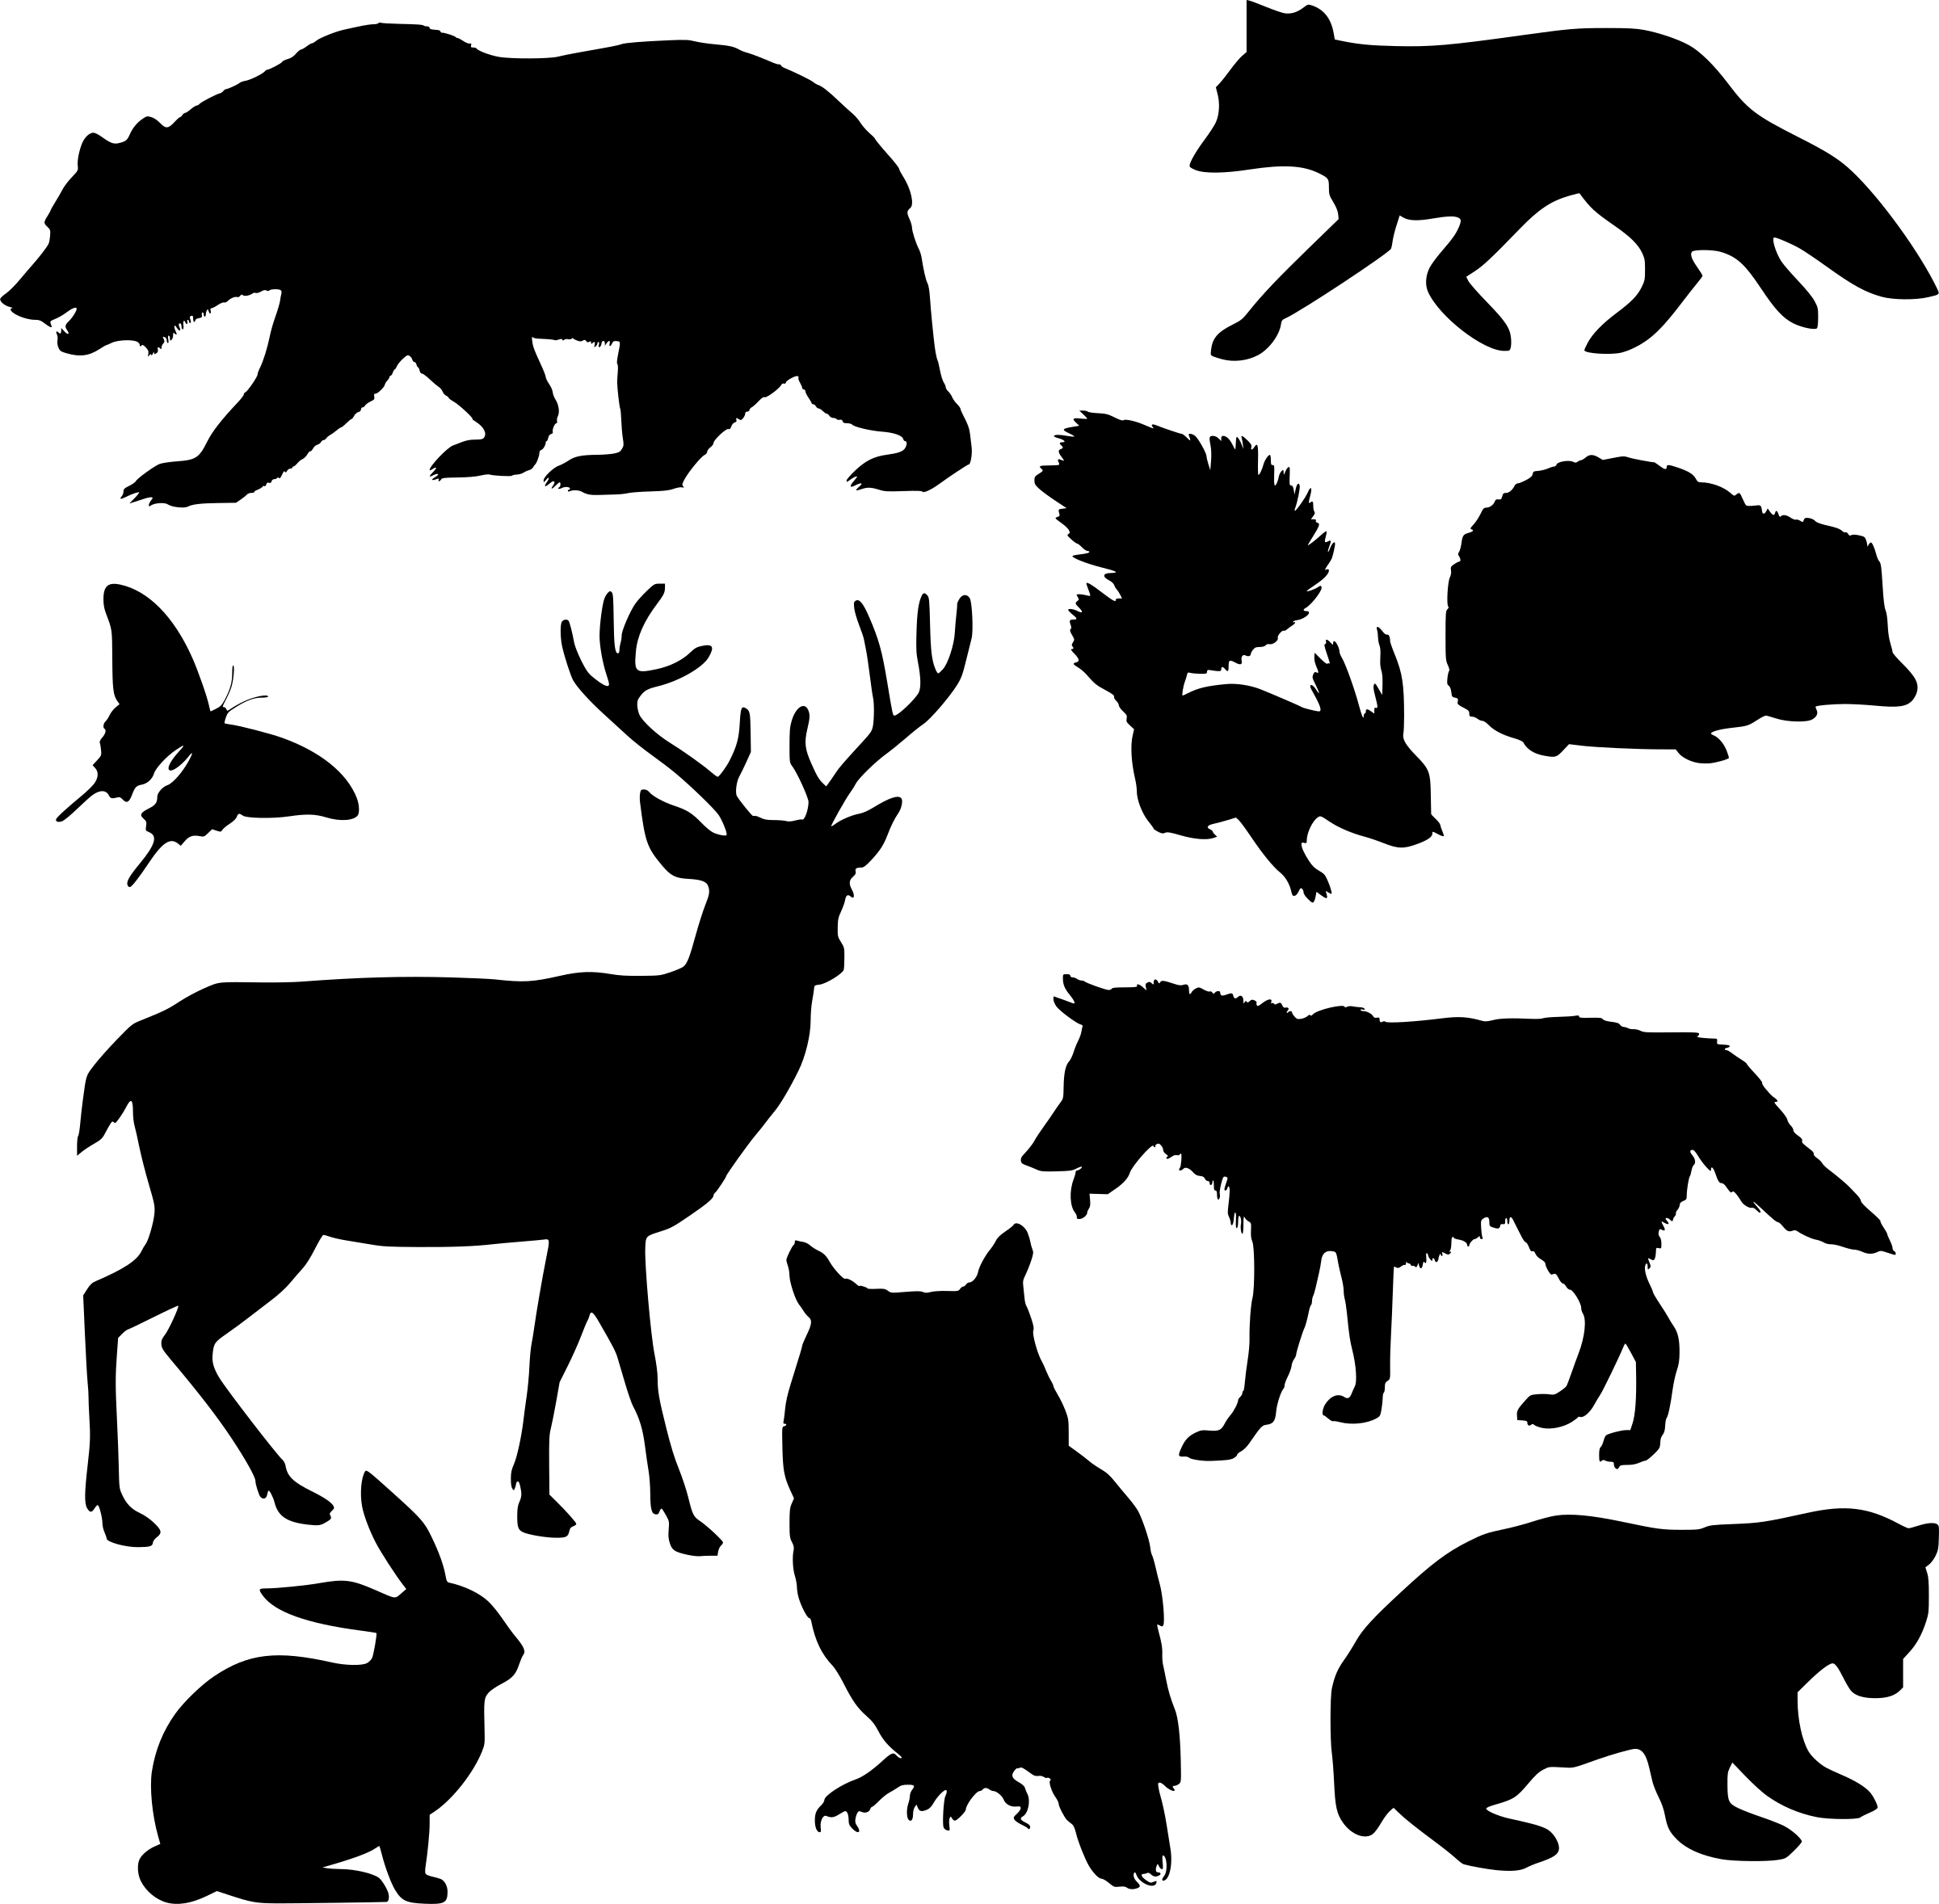 svg Woodland animal clipart. Animals silhouette big image